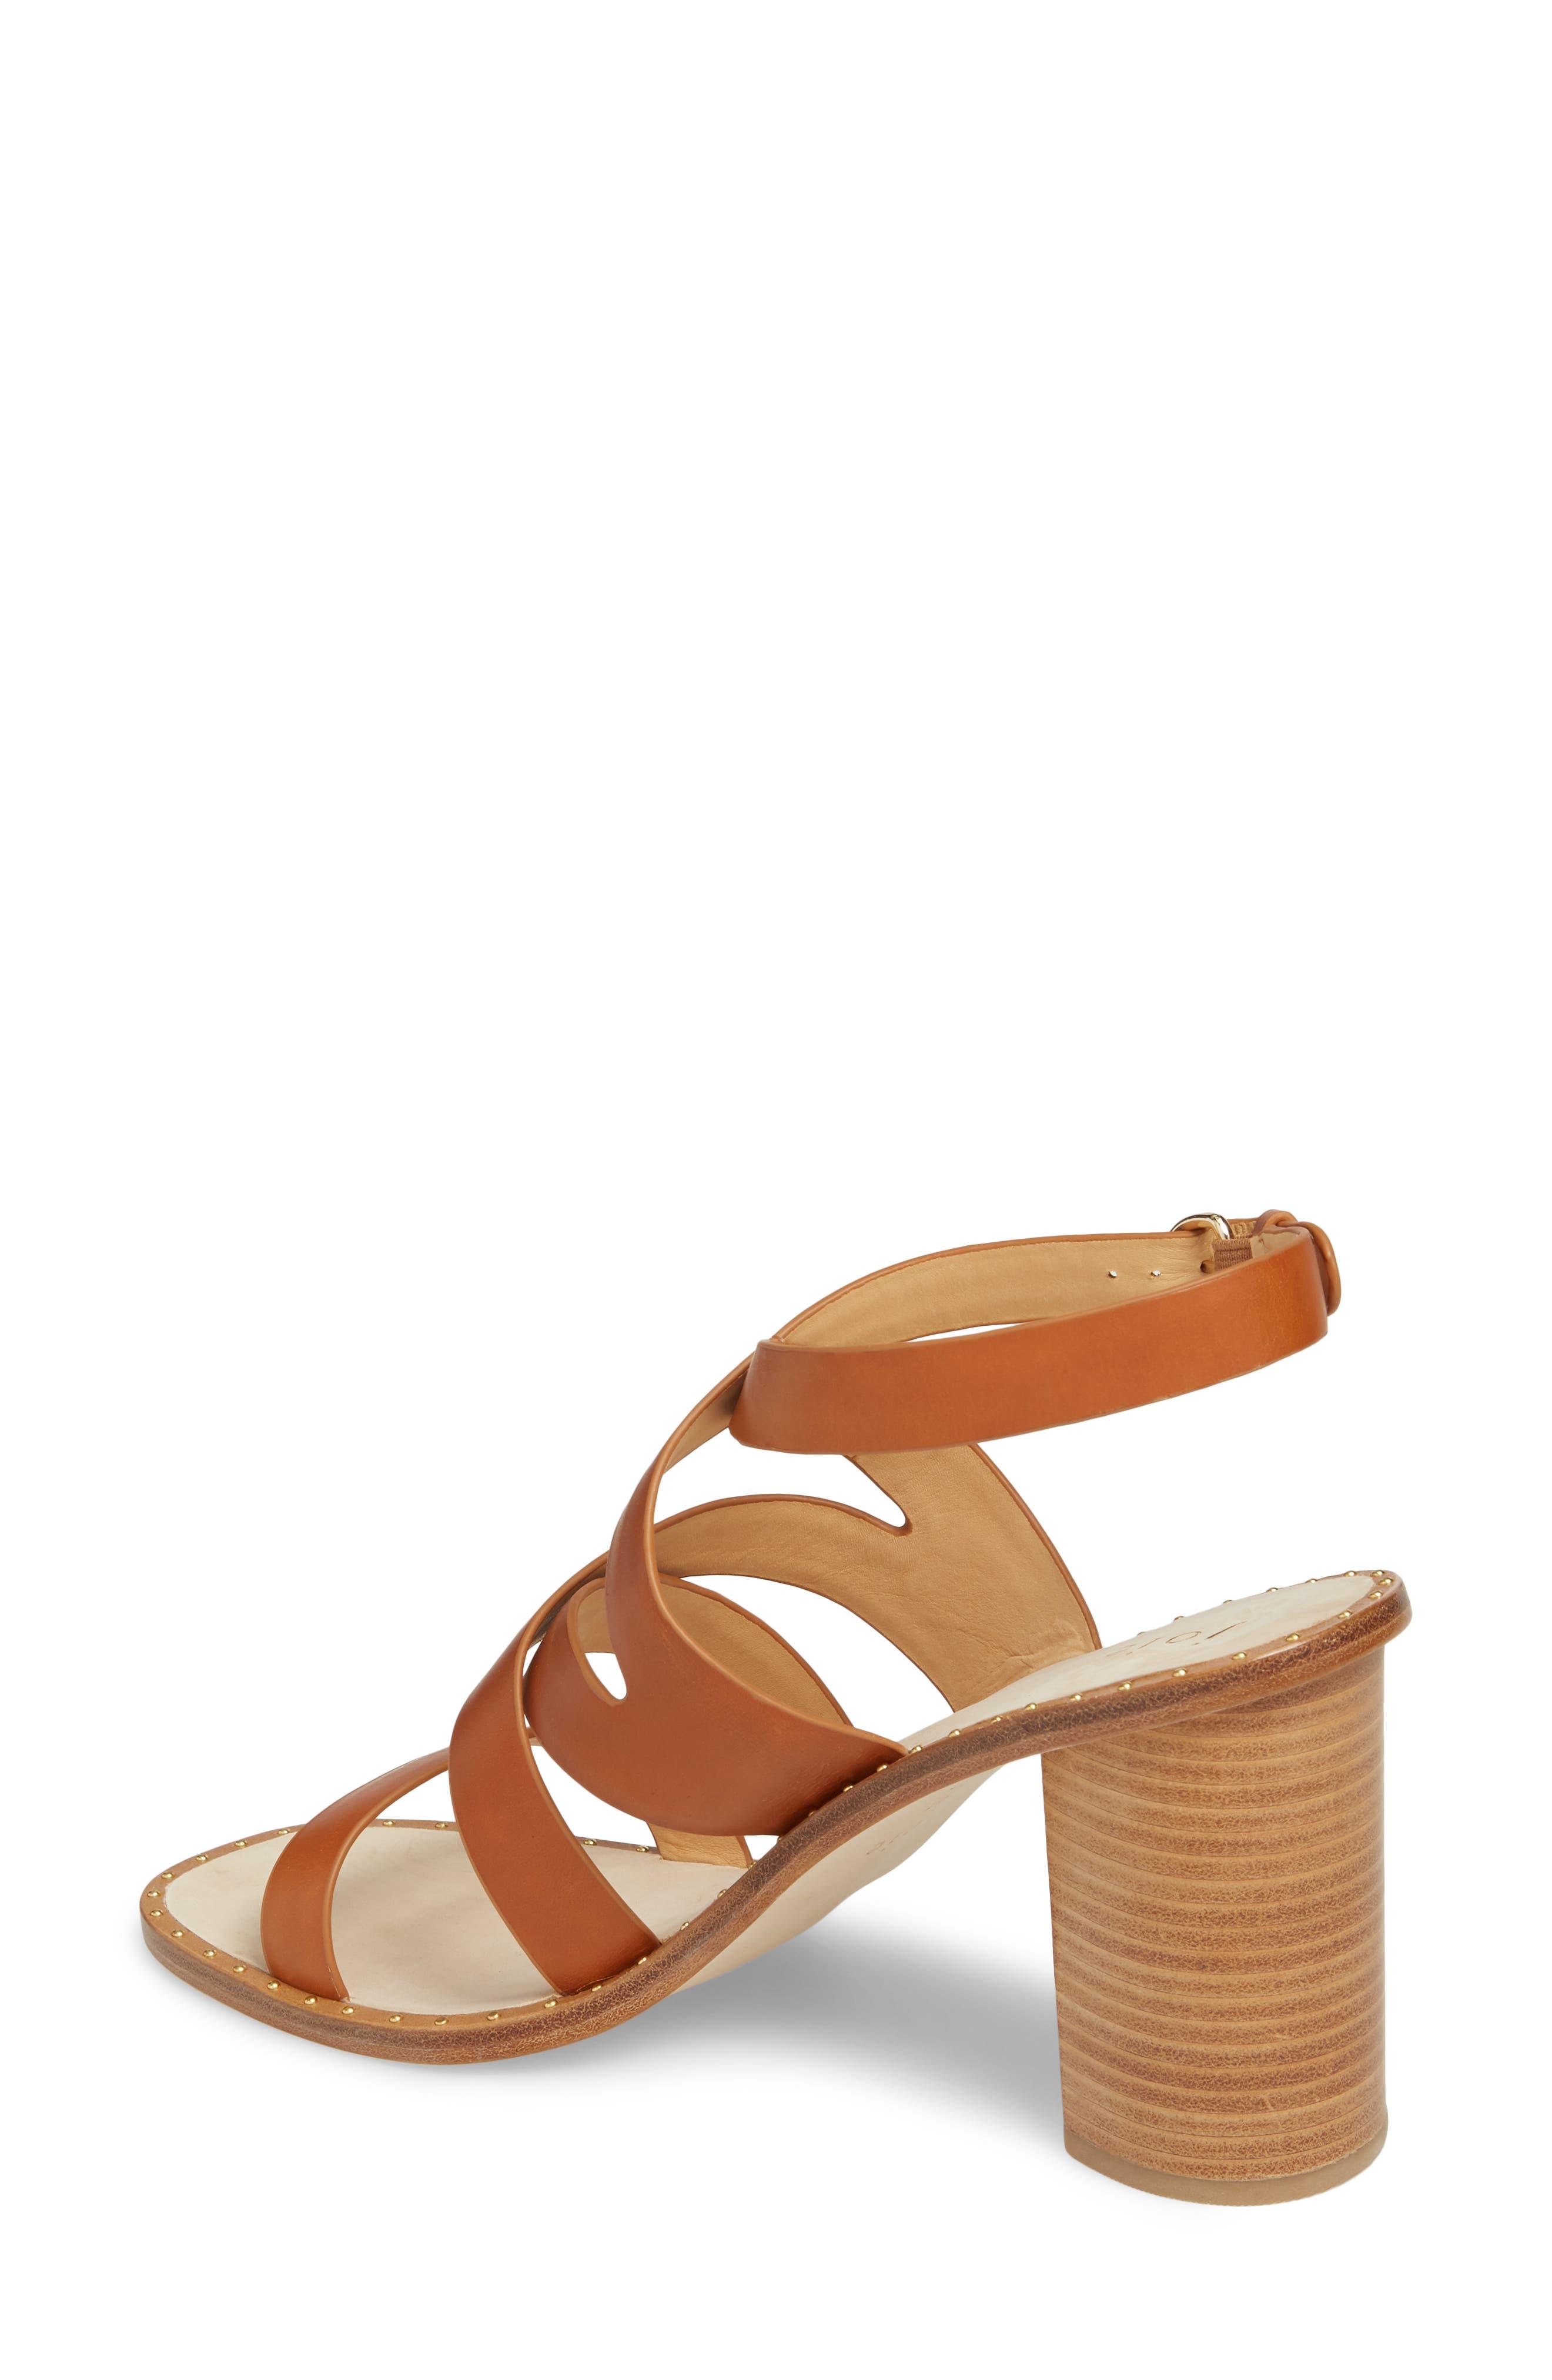 Onfer Studded Strappy Sandal,                             Alternate thumbnail 2, color,                             Tan